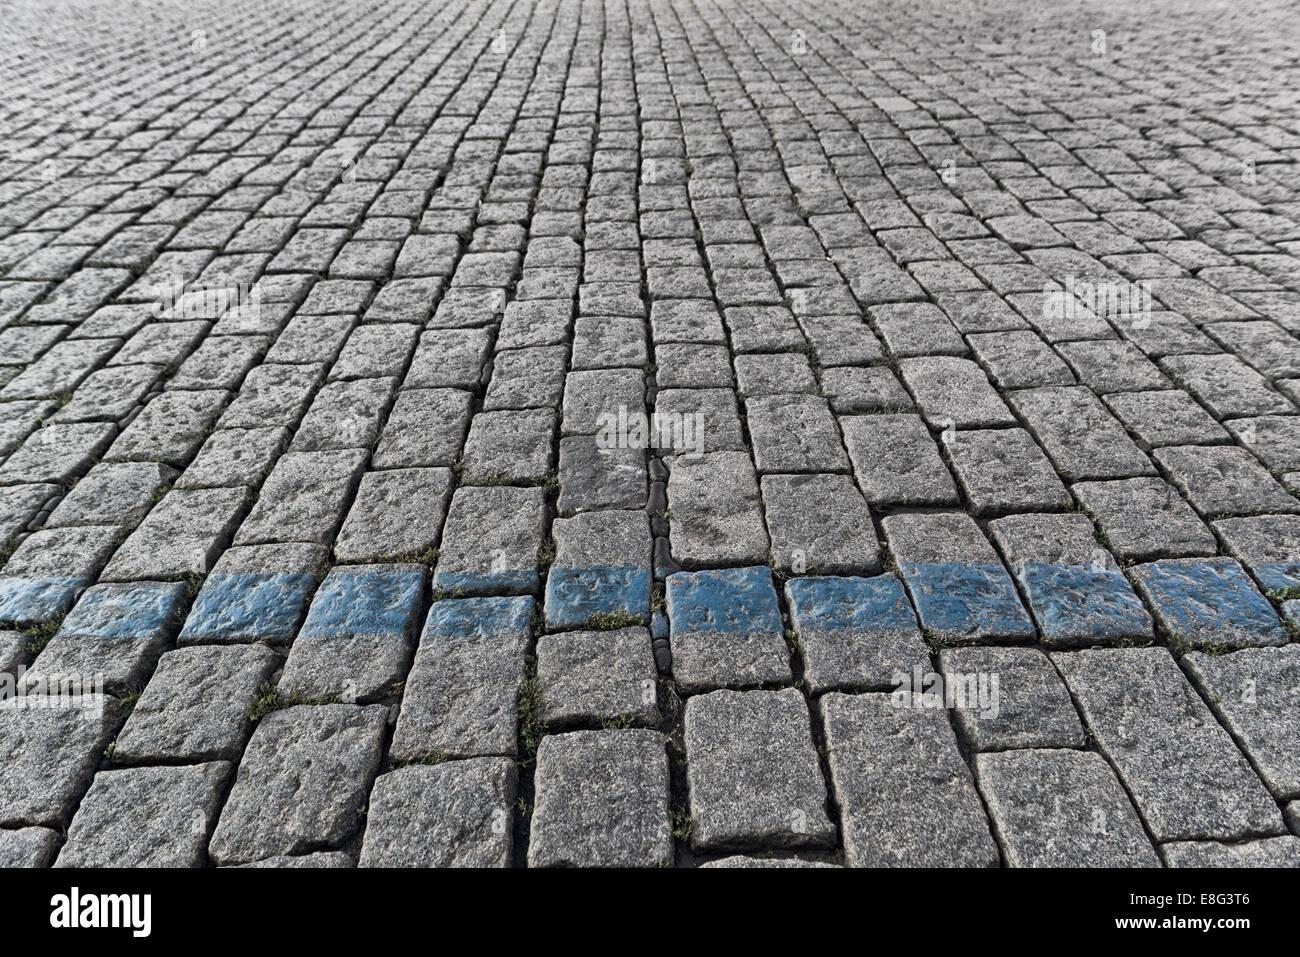 Cobblestone pavement pattern vanishing in street perspective - Stock Image